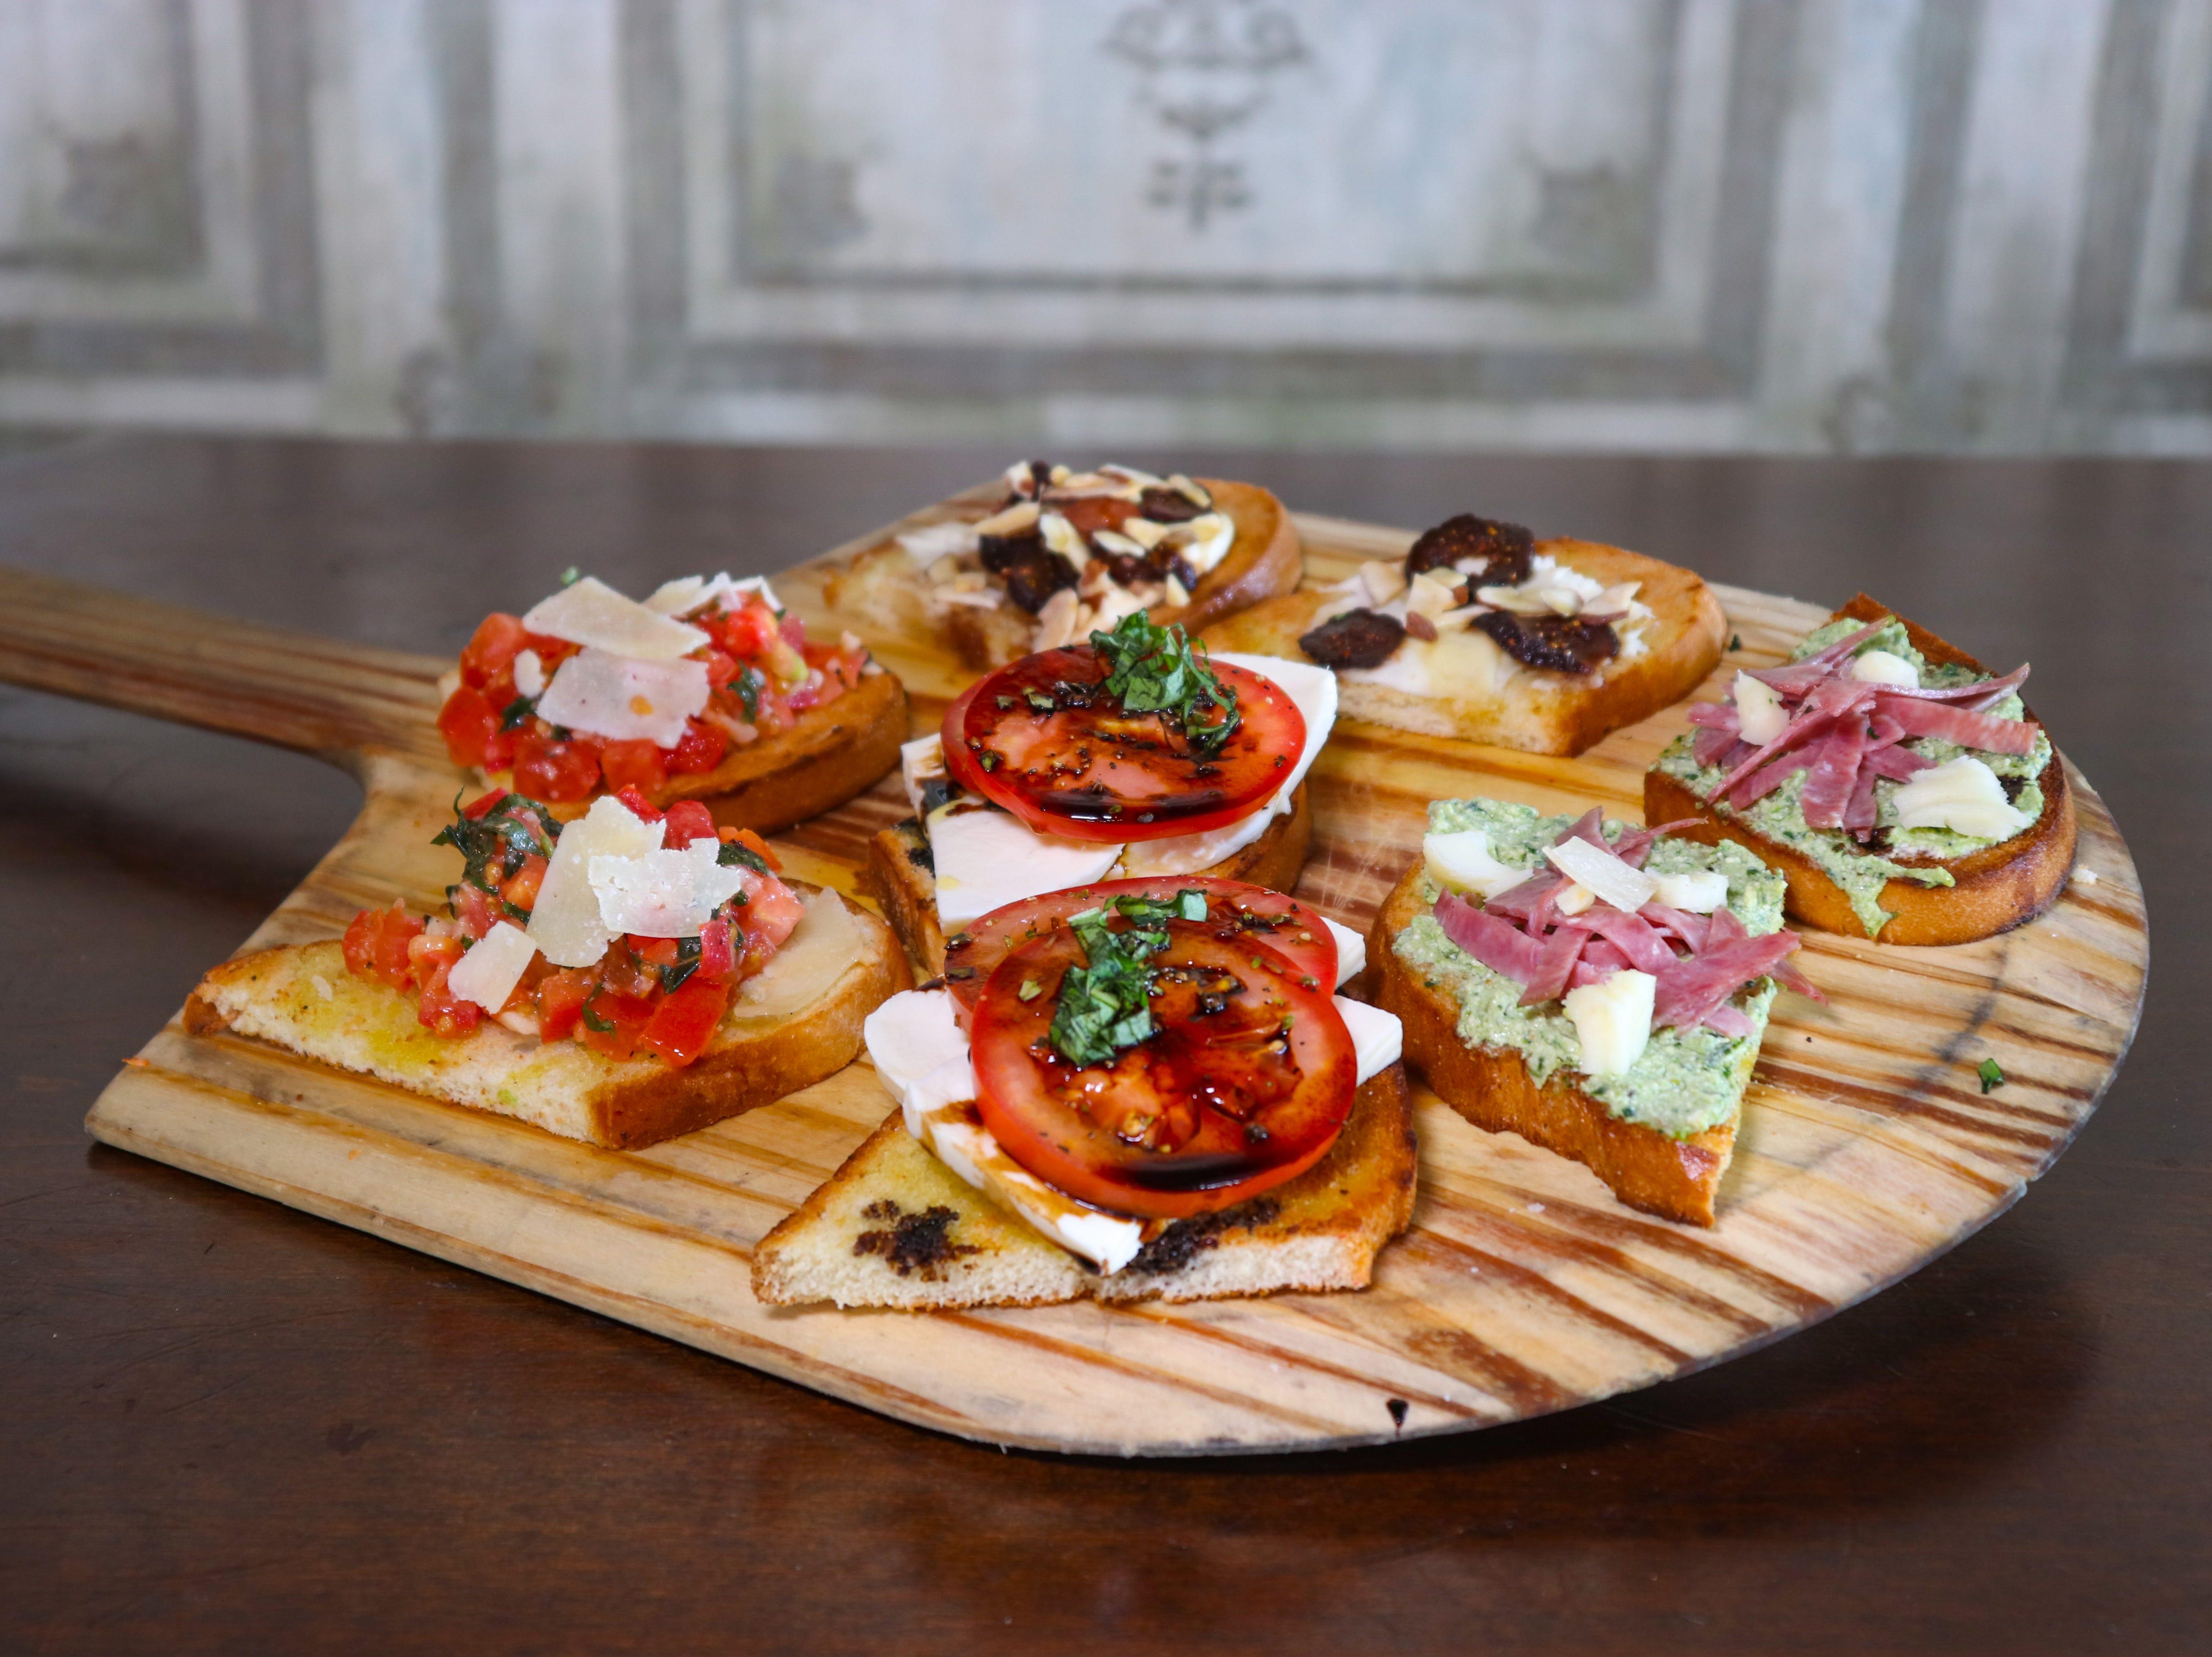 Bruschetta board at Crust Pizzeria and Italian restaurant.